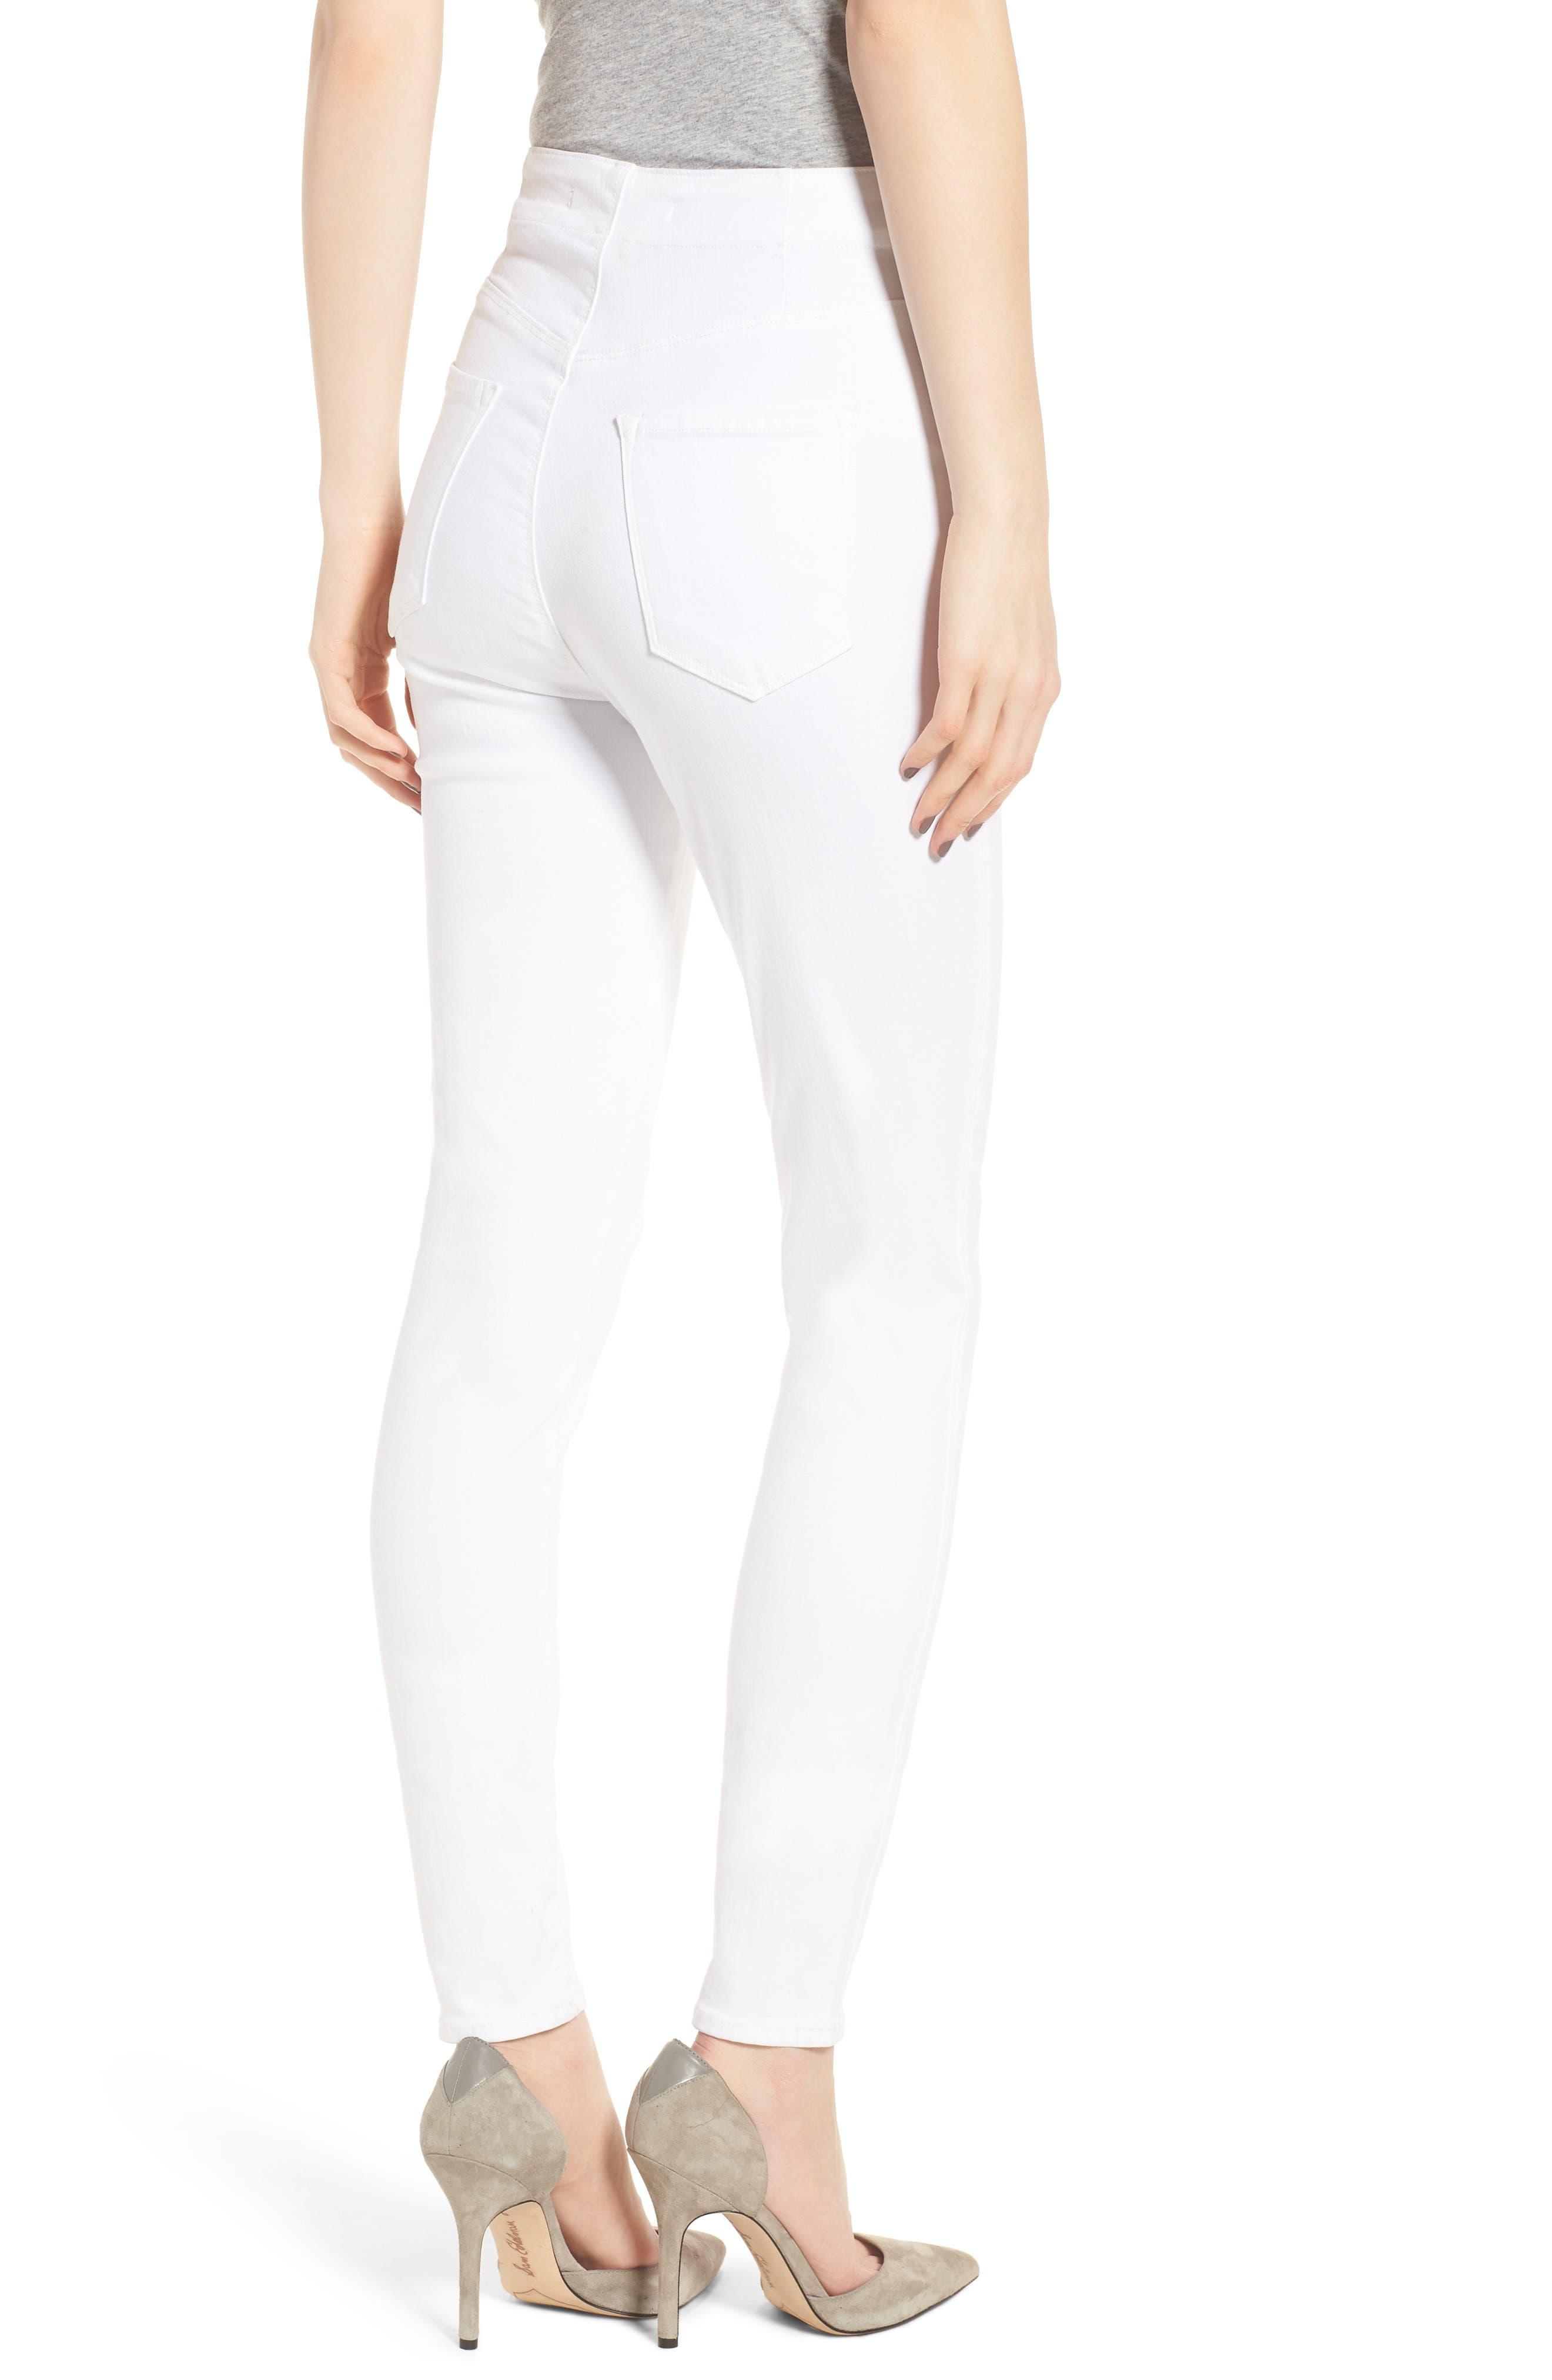 Natasha Sky High Super Skinny Jeans,                             Alternate thumbnail 2, color,                             WHITE